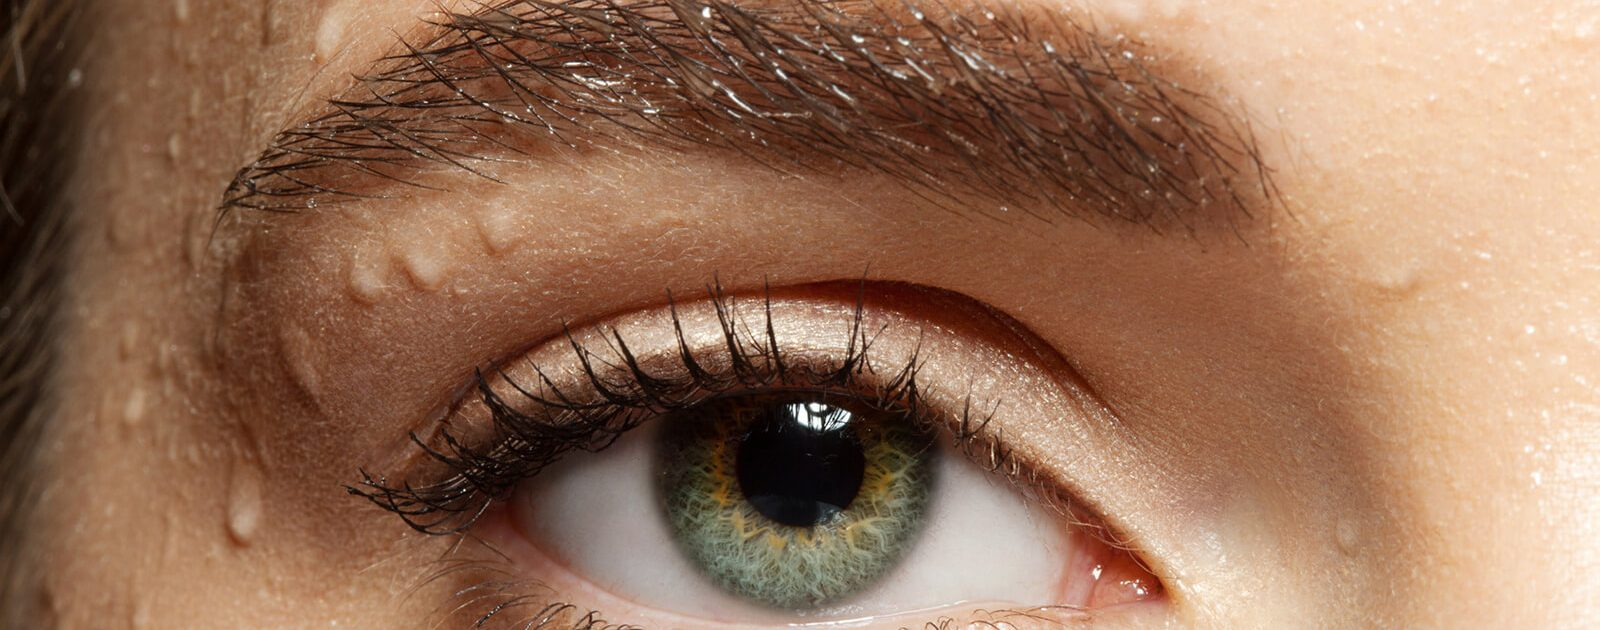 Trockene Augen (Sicca-Syndrom): Auge in Nahaufnahme.